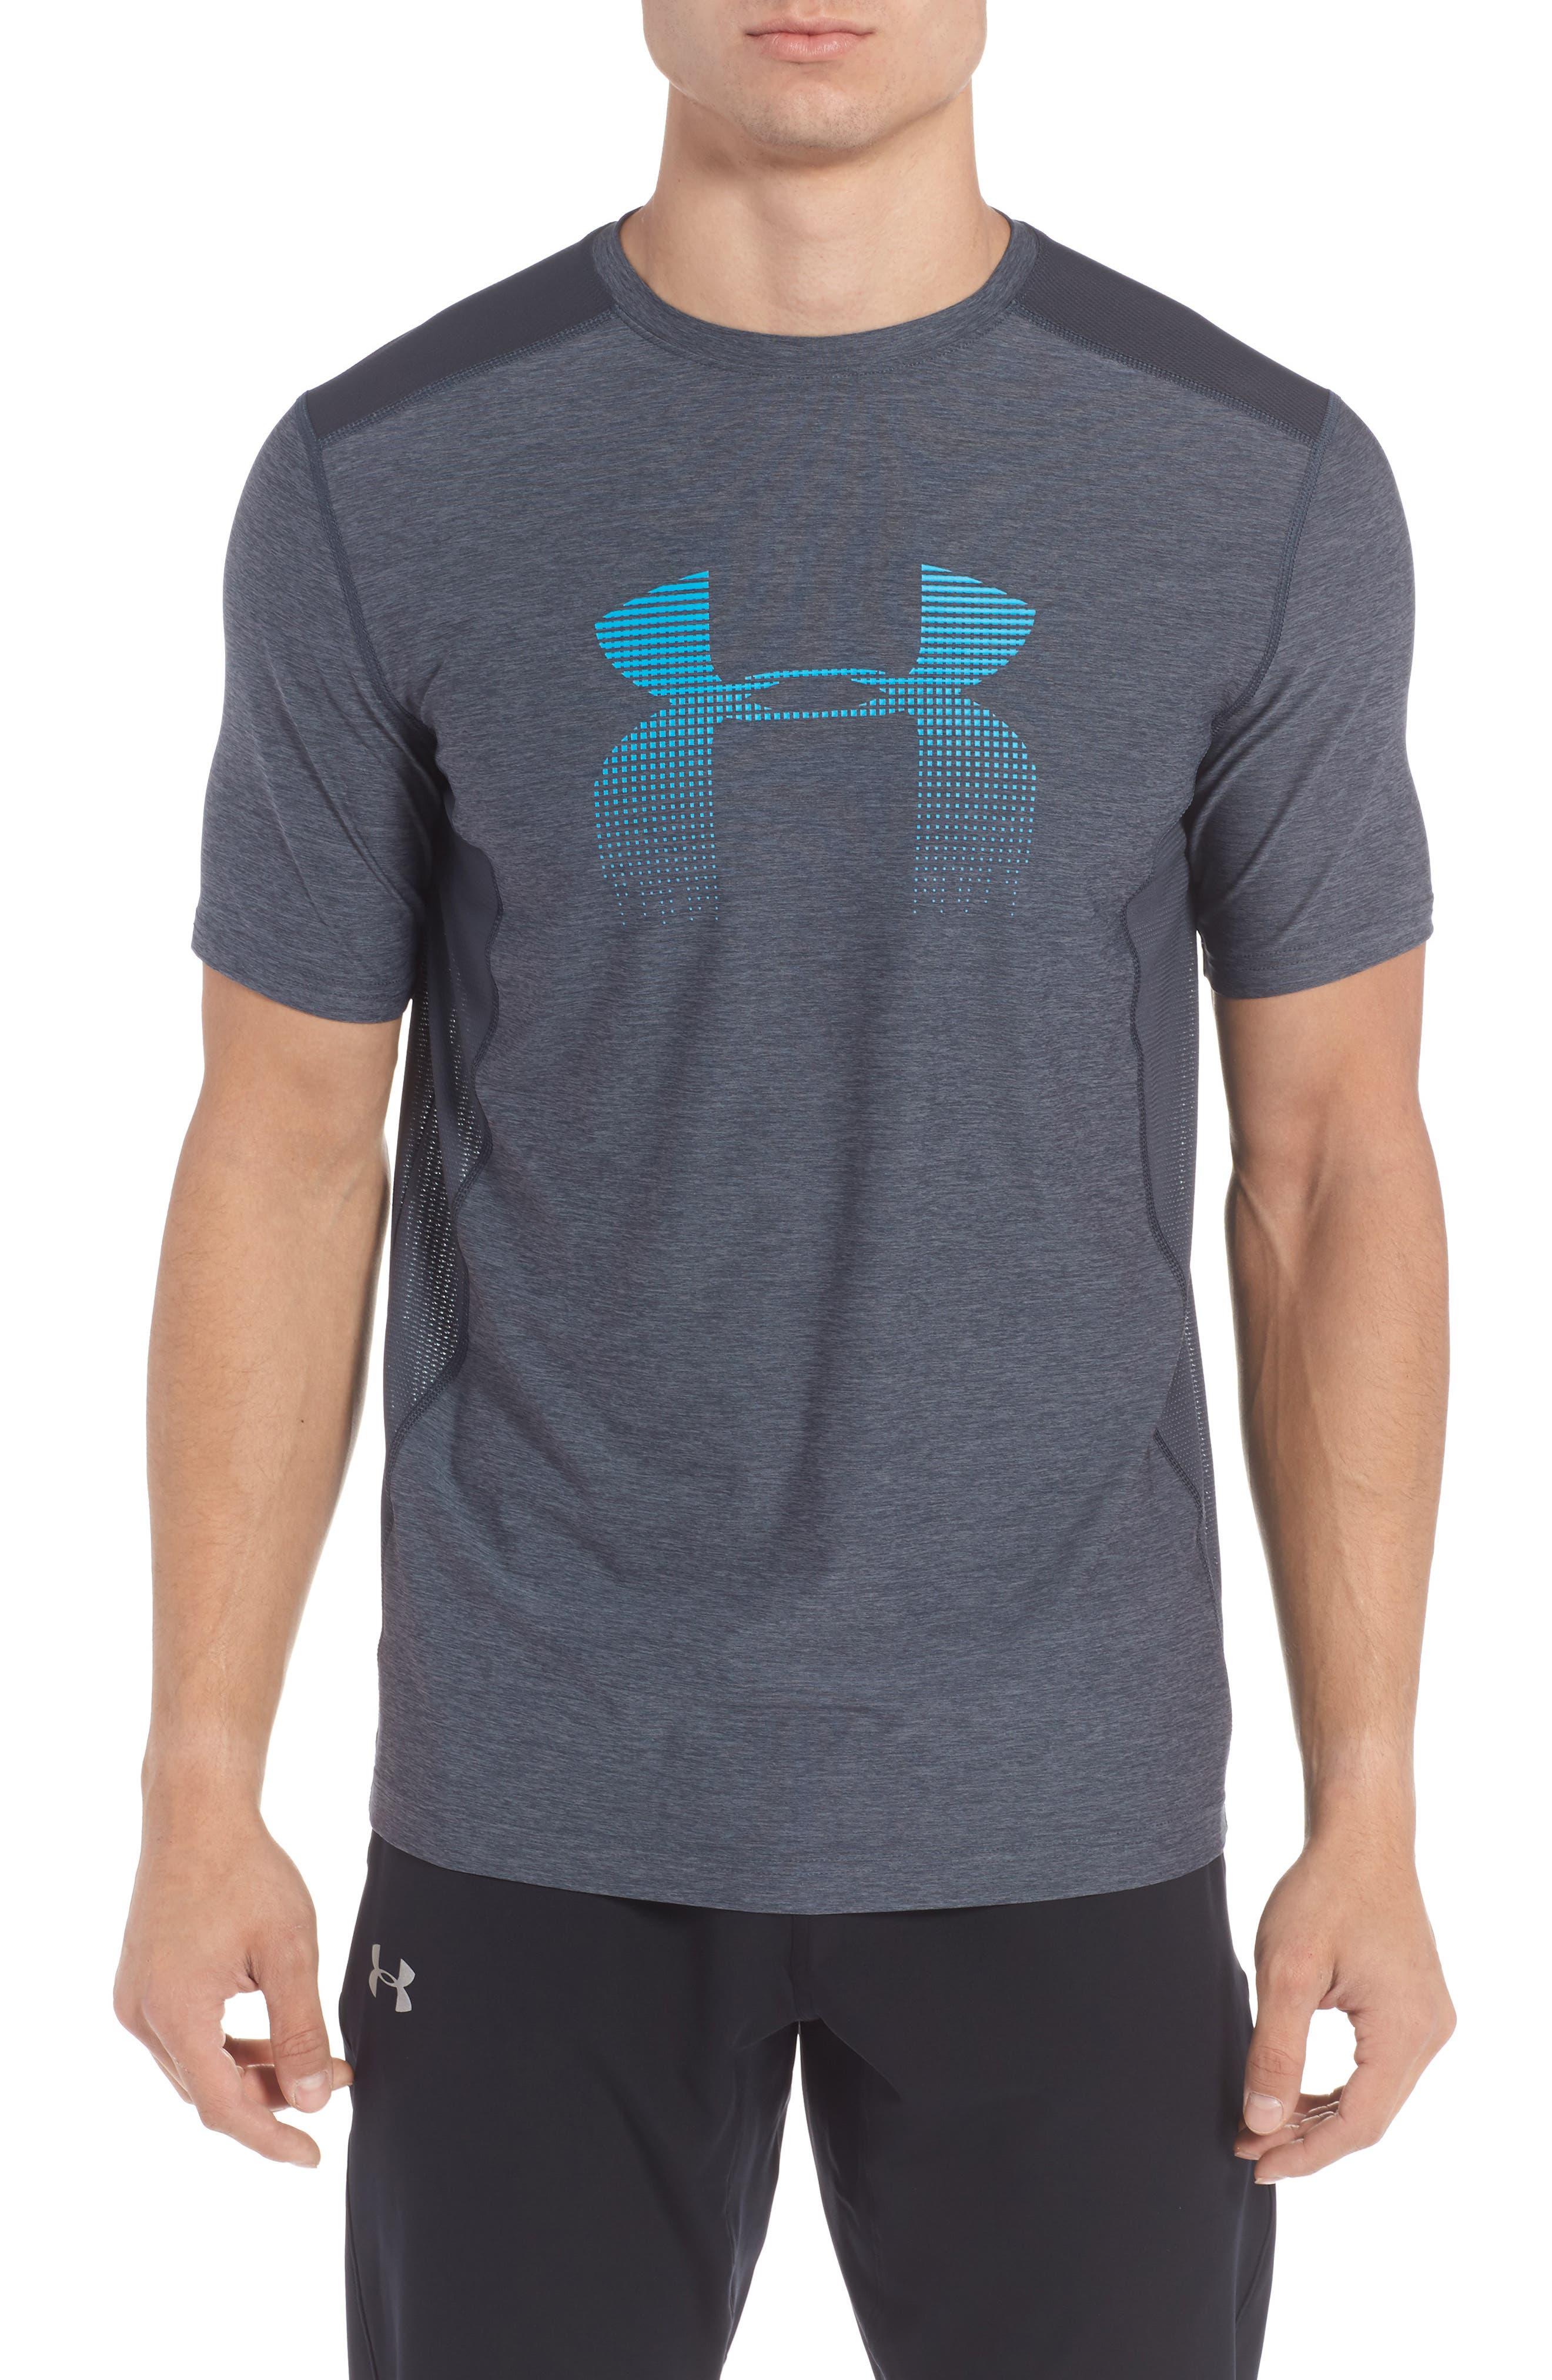 Raid Graphic T-Shirt,                         Main,                         color, Stealth Grey / / Blue Shift